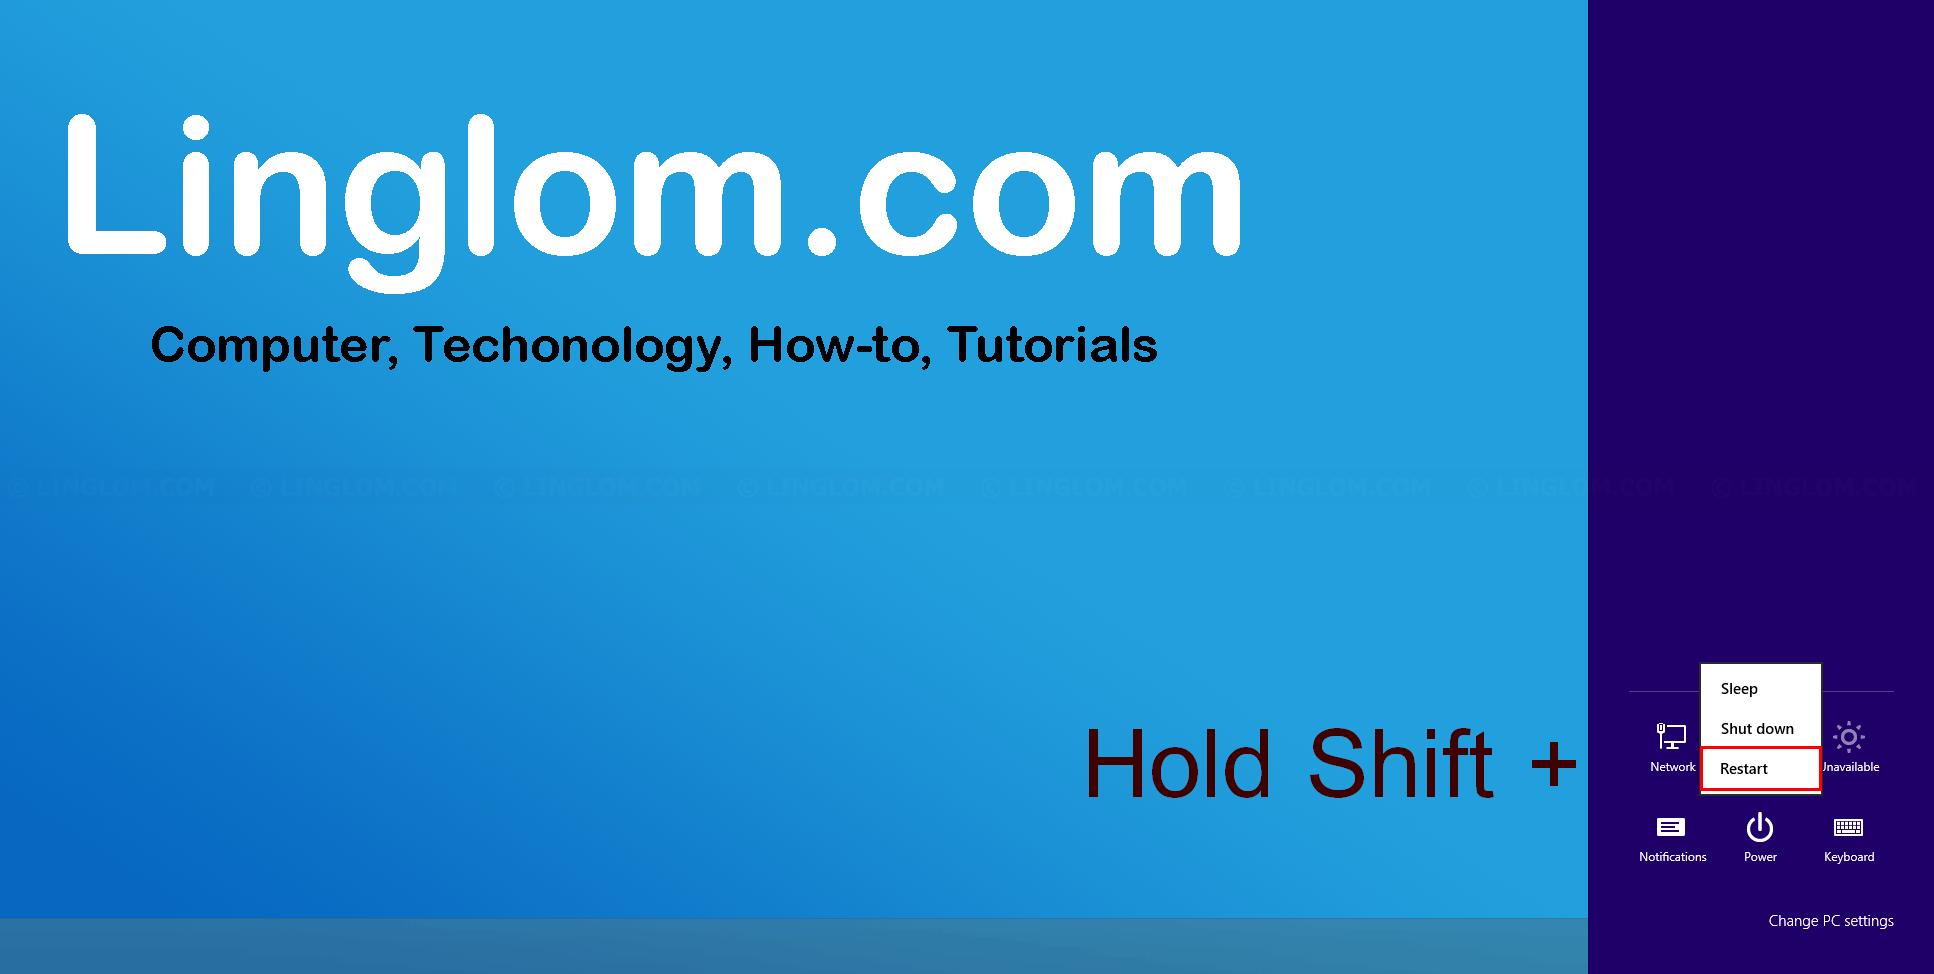 Enter recovery mode from Windows 8.1 desktop